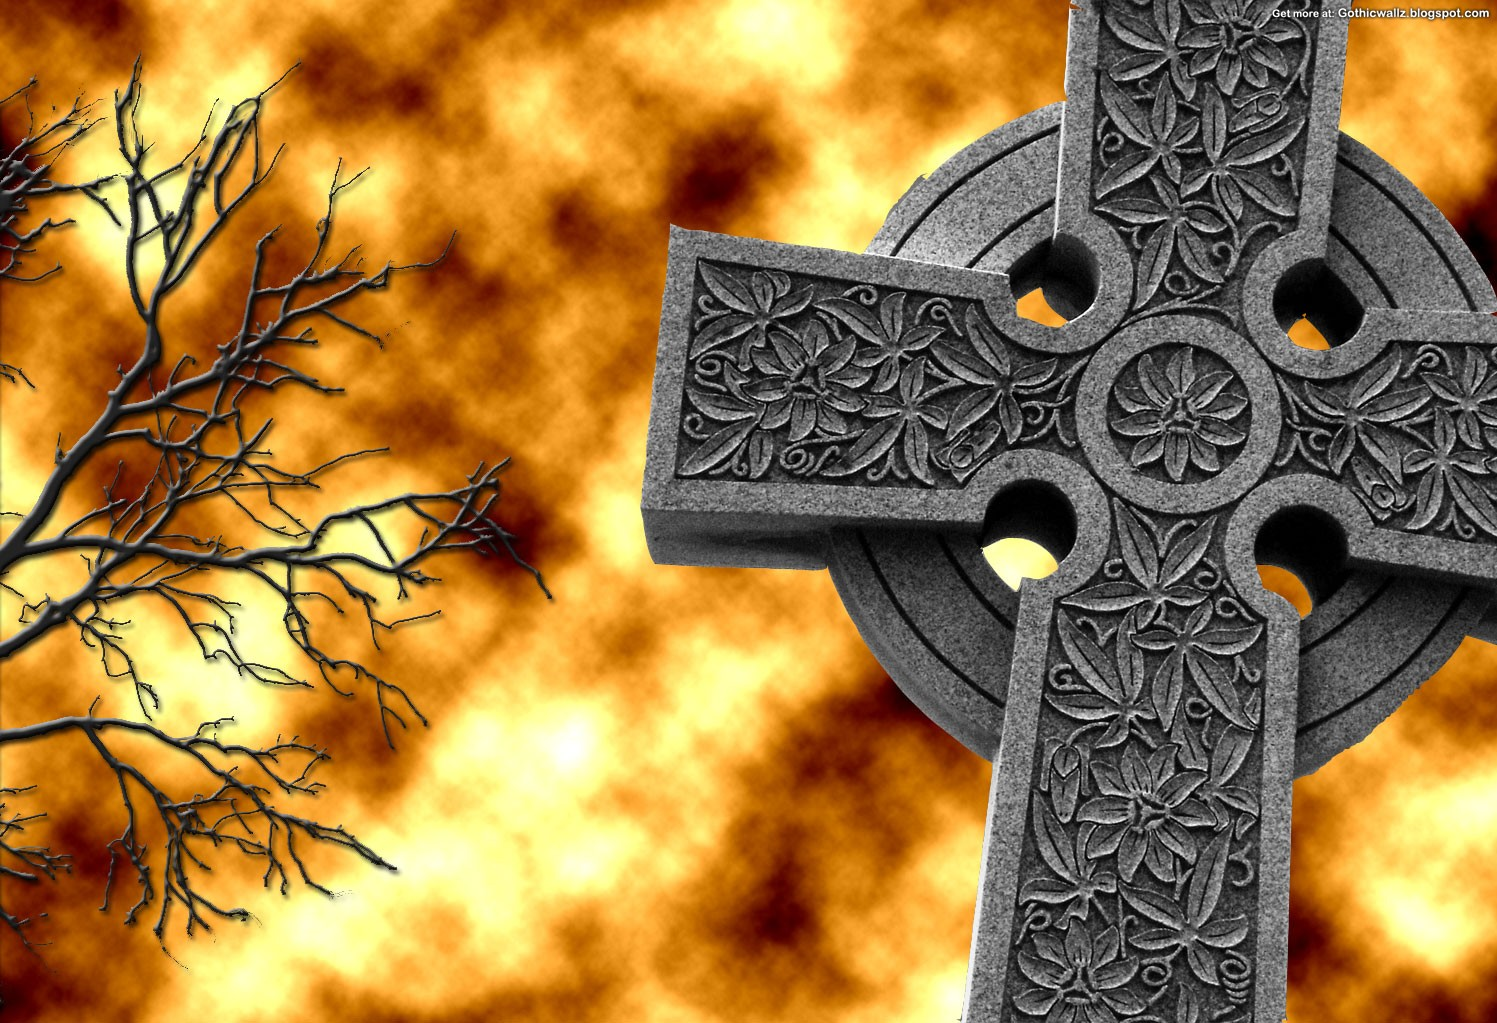 Wallpaper: Wallpaper Celtic Cross